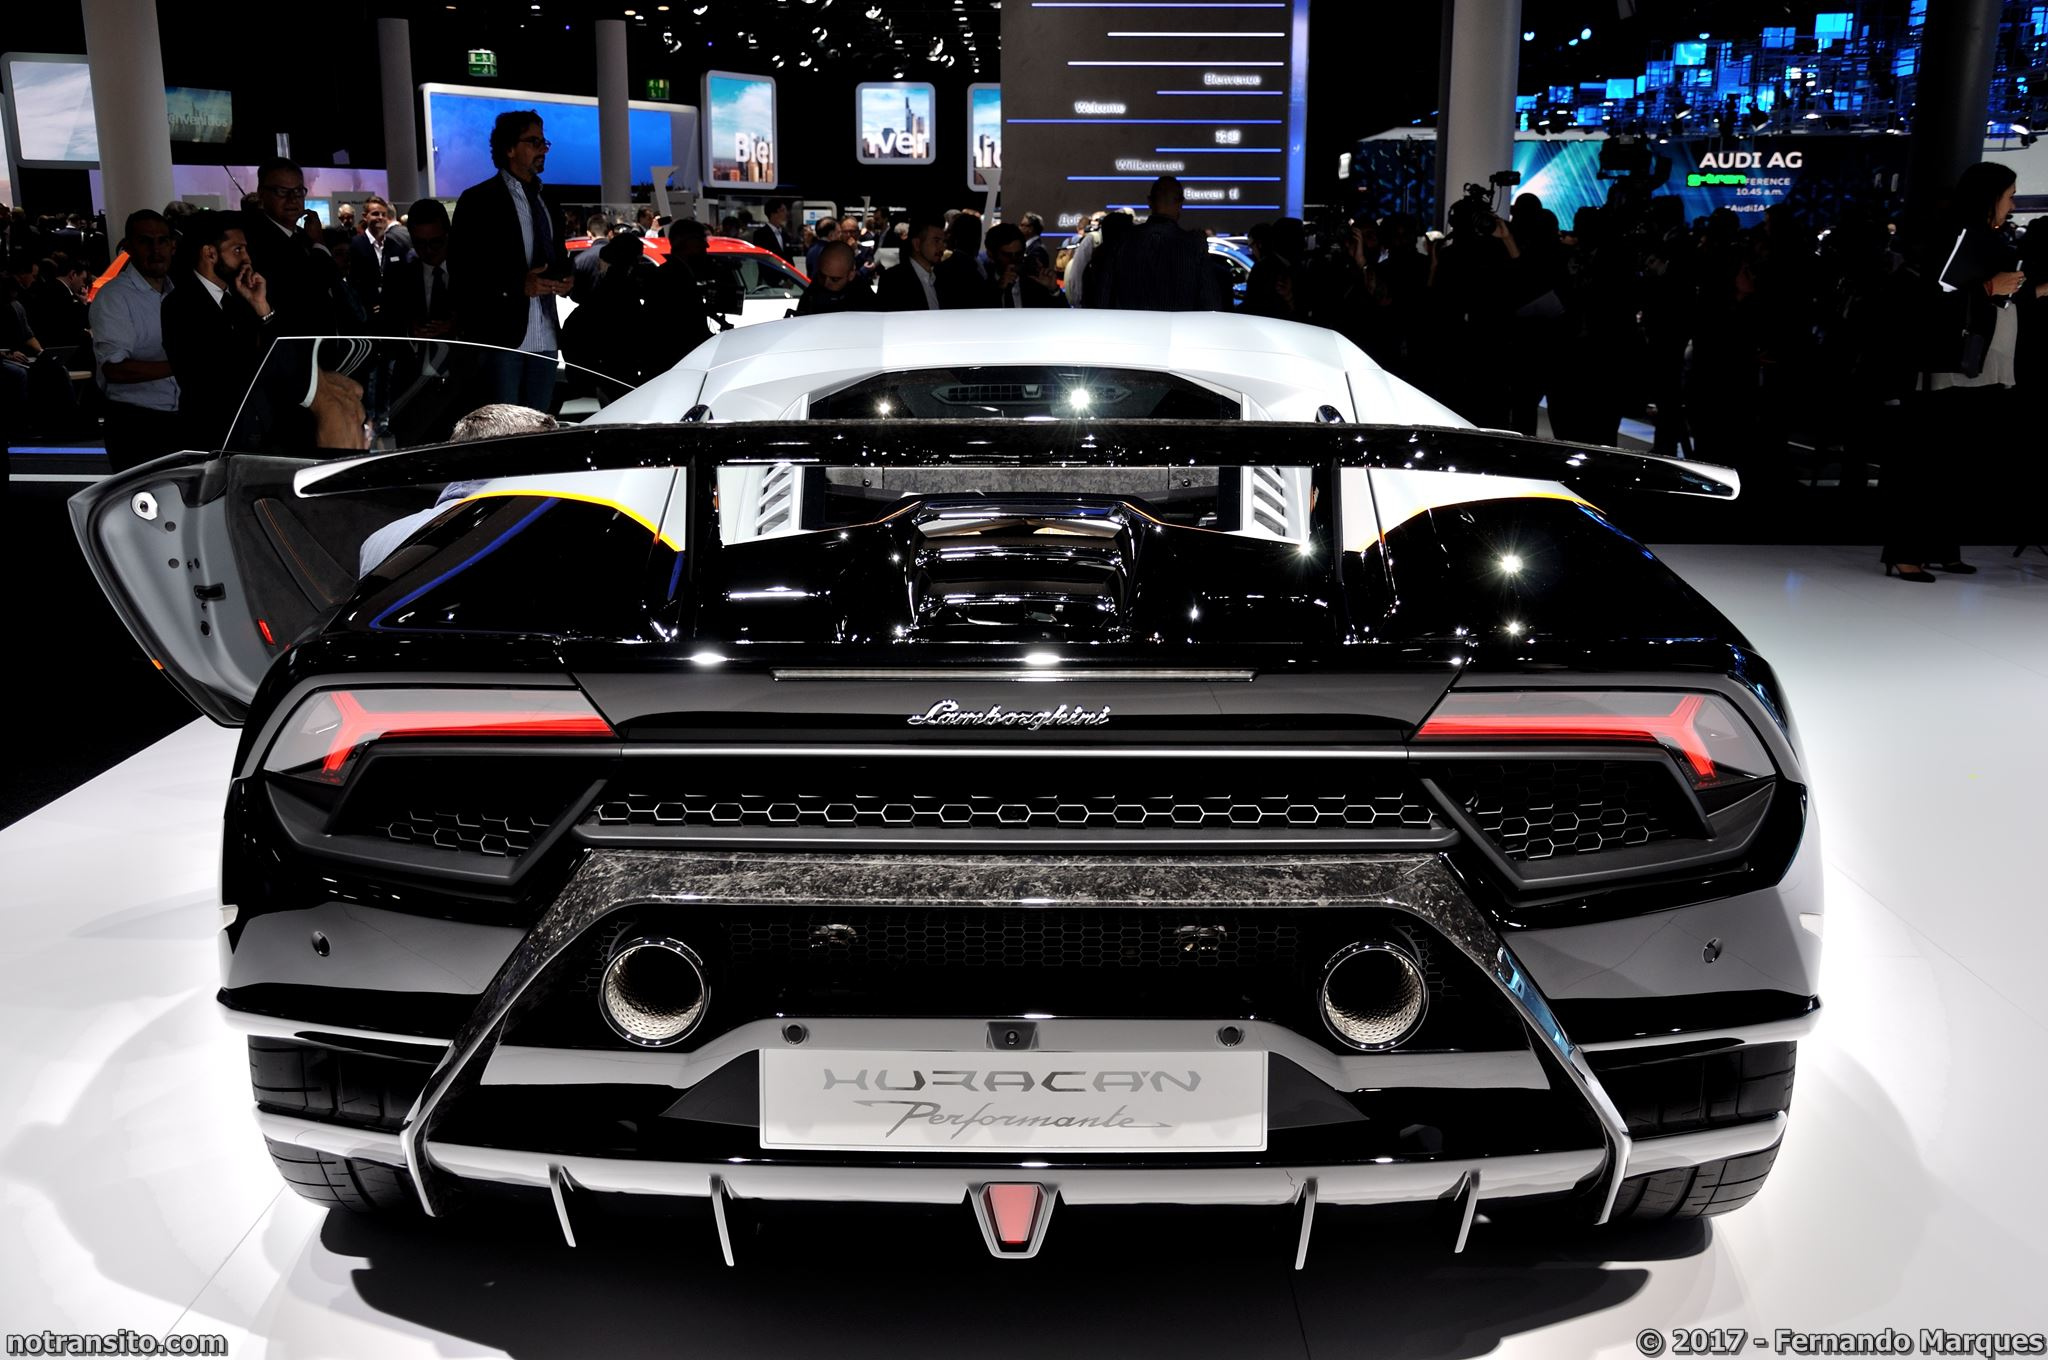 Lamborghini-Huracan-Performante-Frankfurt-2017-011